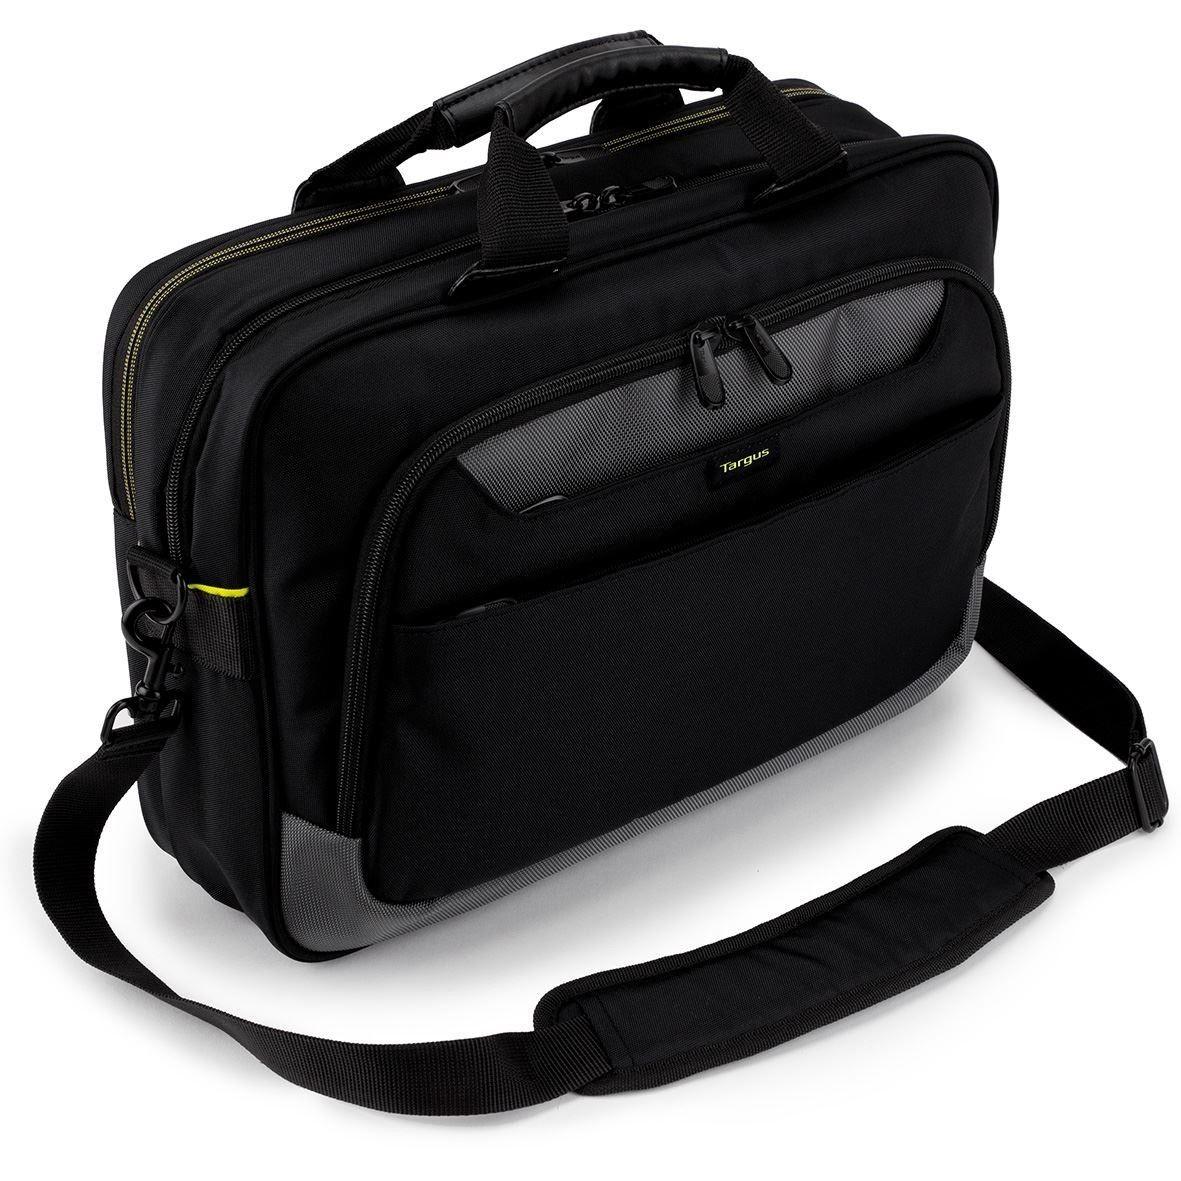 Targus torba do notebooka CityGear 15-17.3 Topload czarna